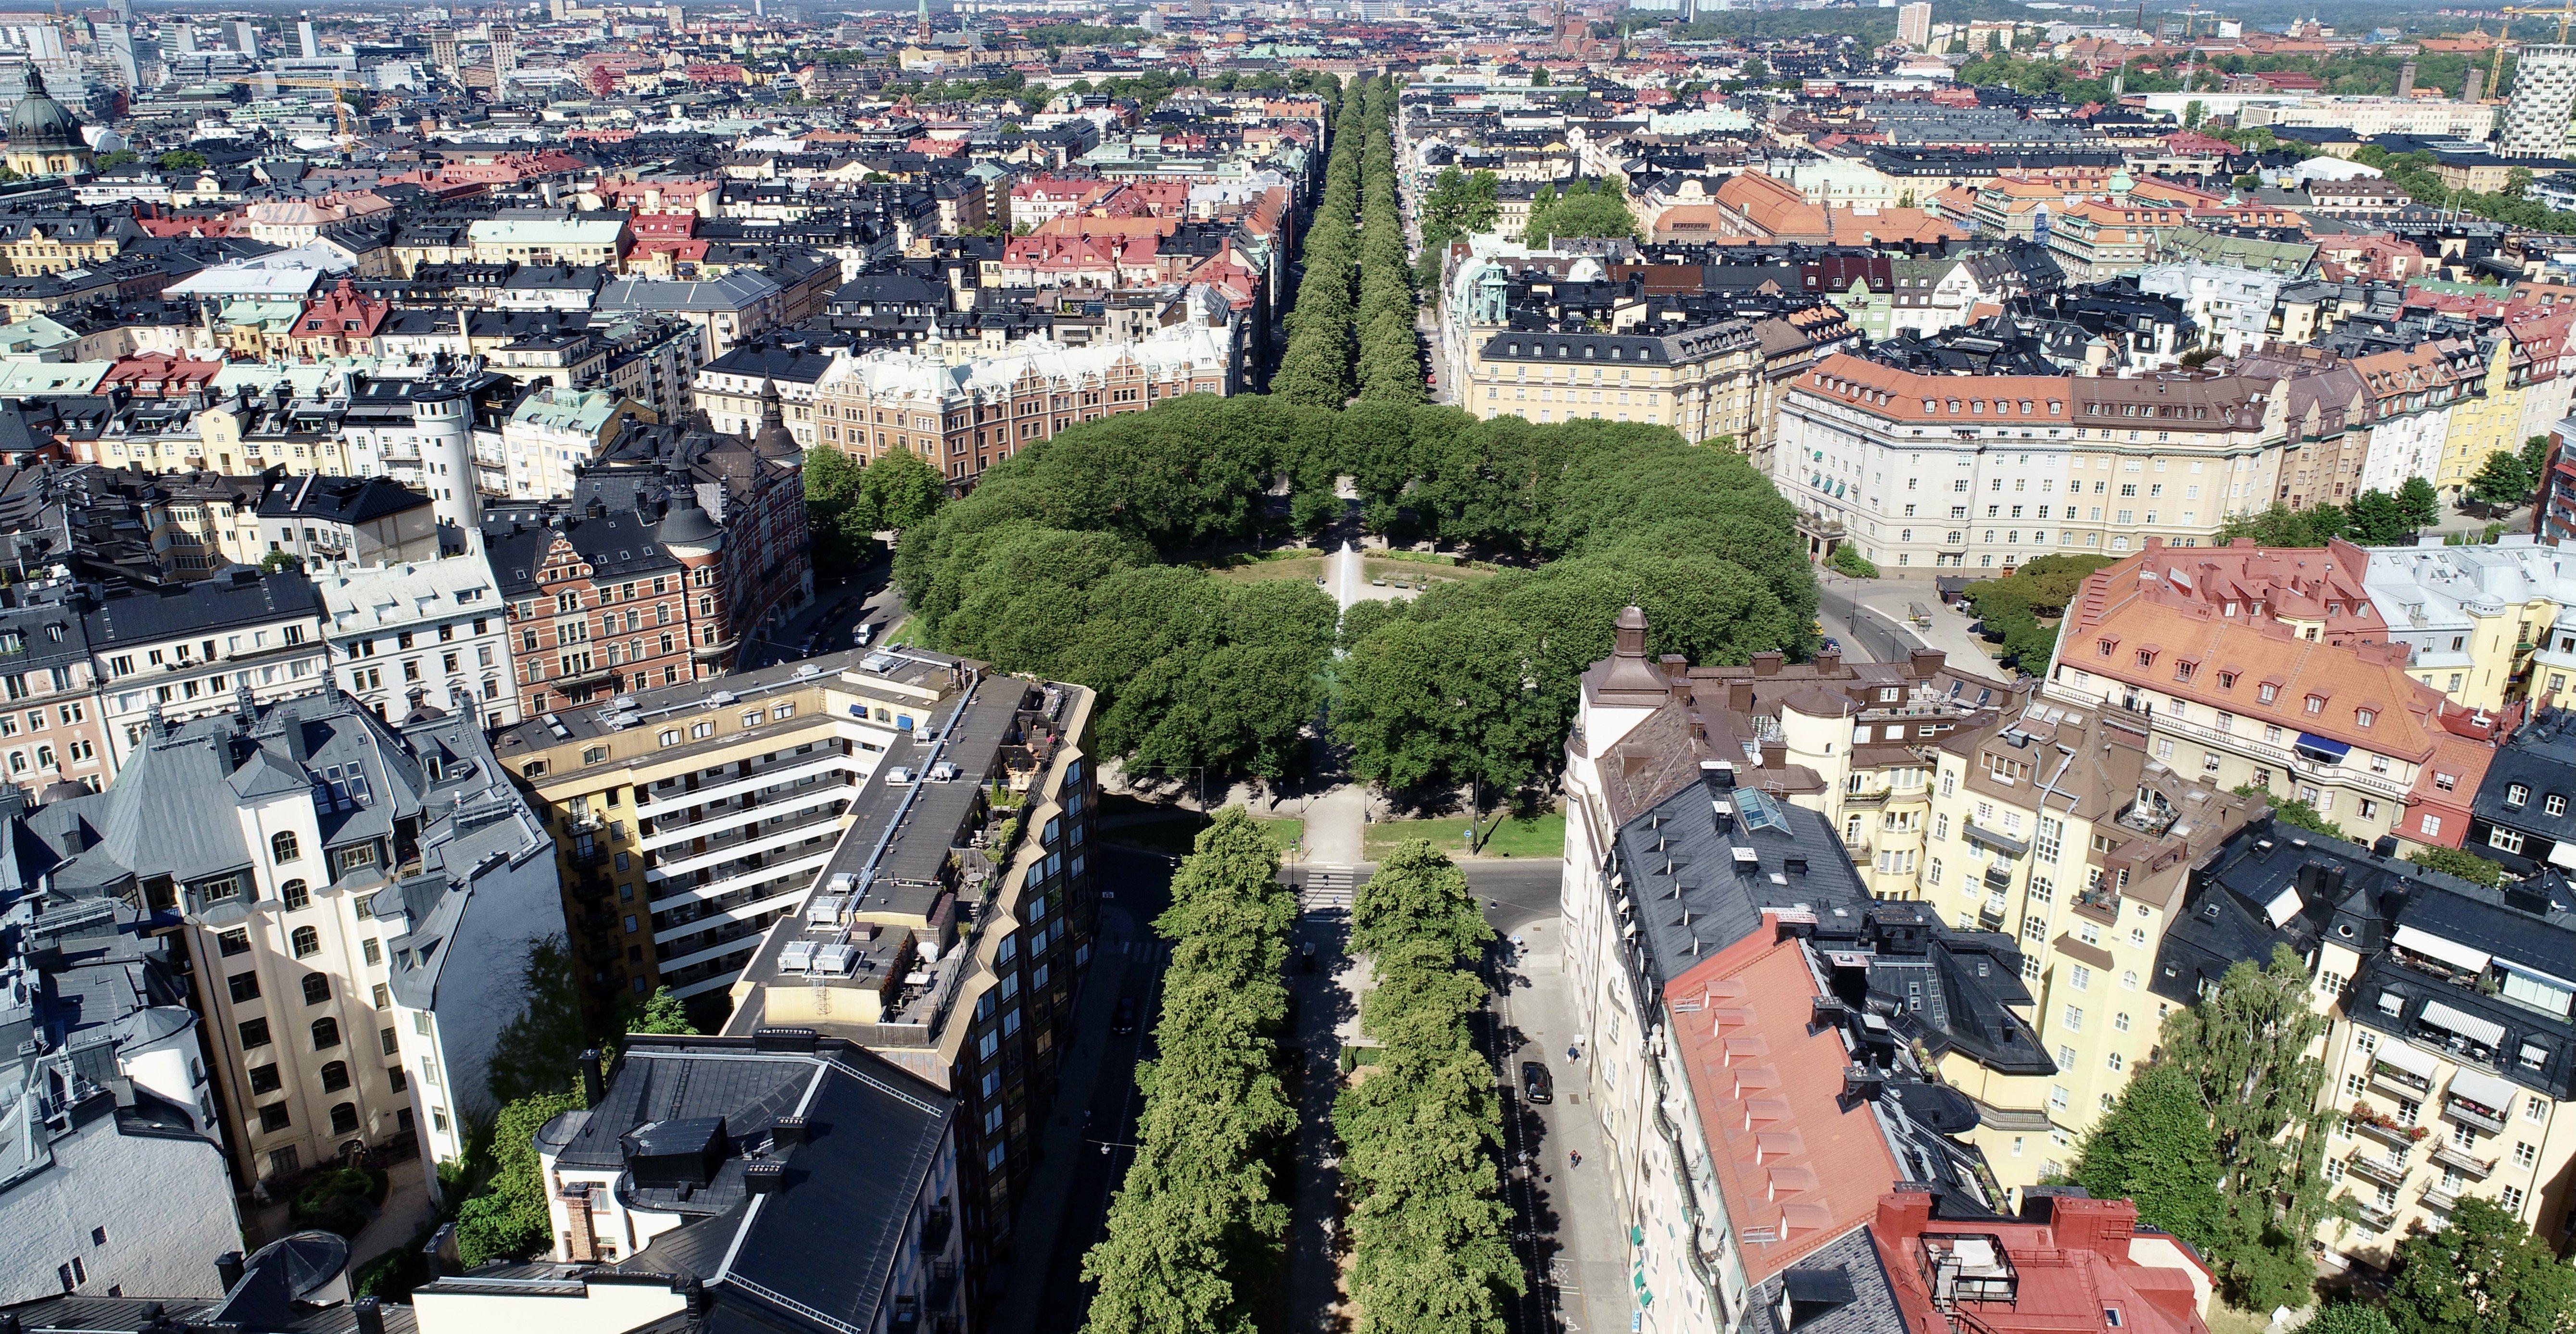 Karlaplan / Karlavägen, Östermalm, Stockholm - @karlaplan - karlaplan.com